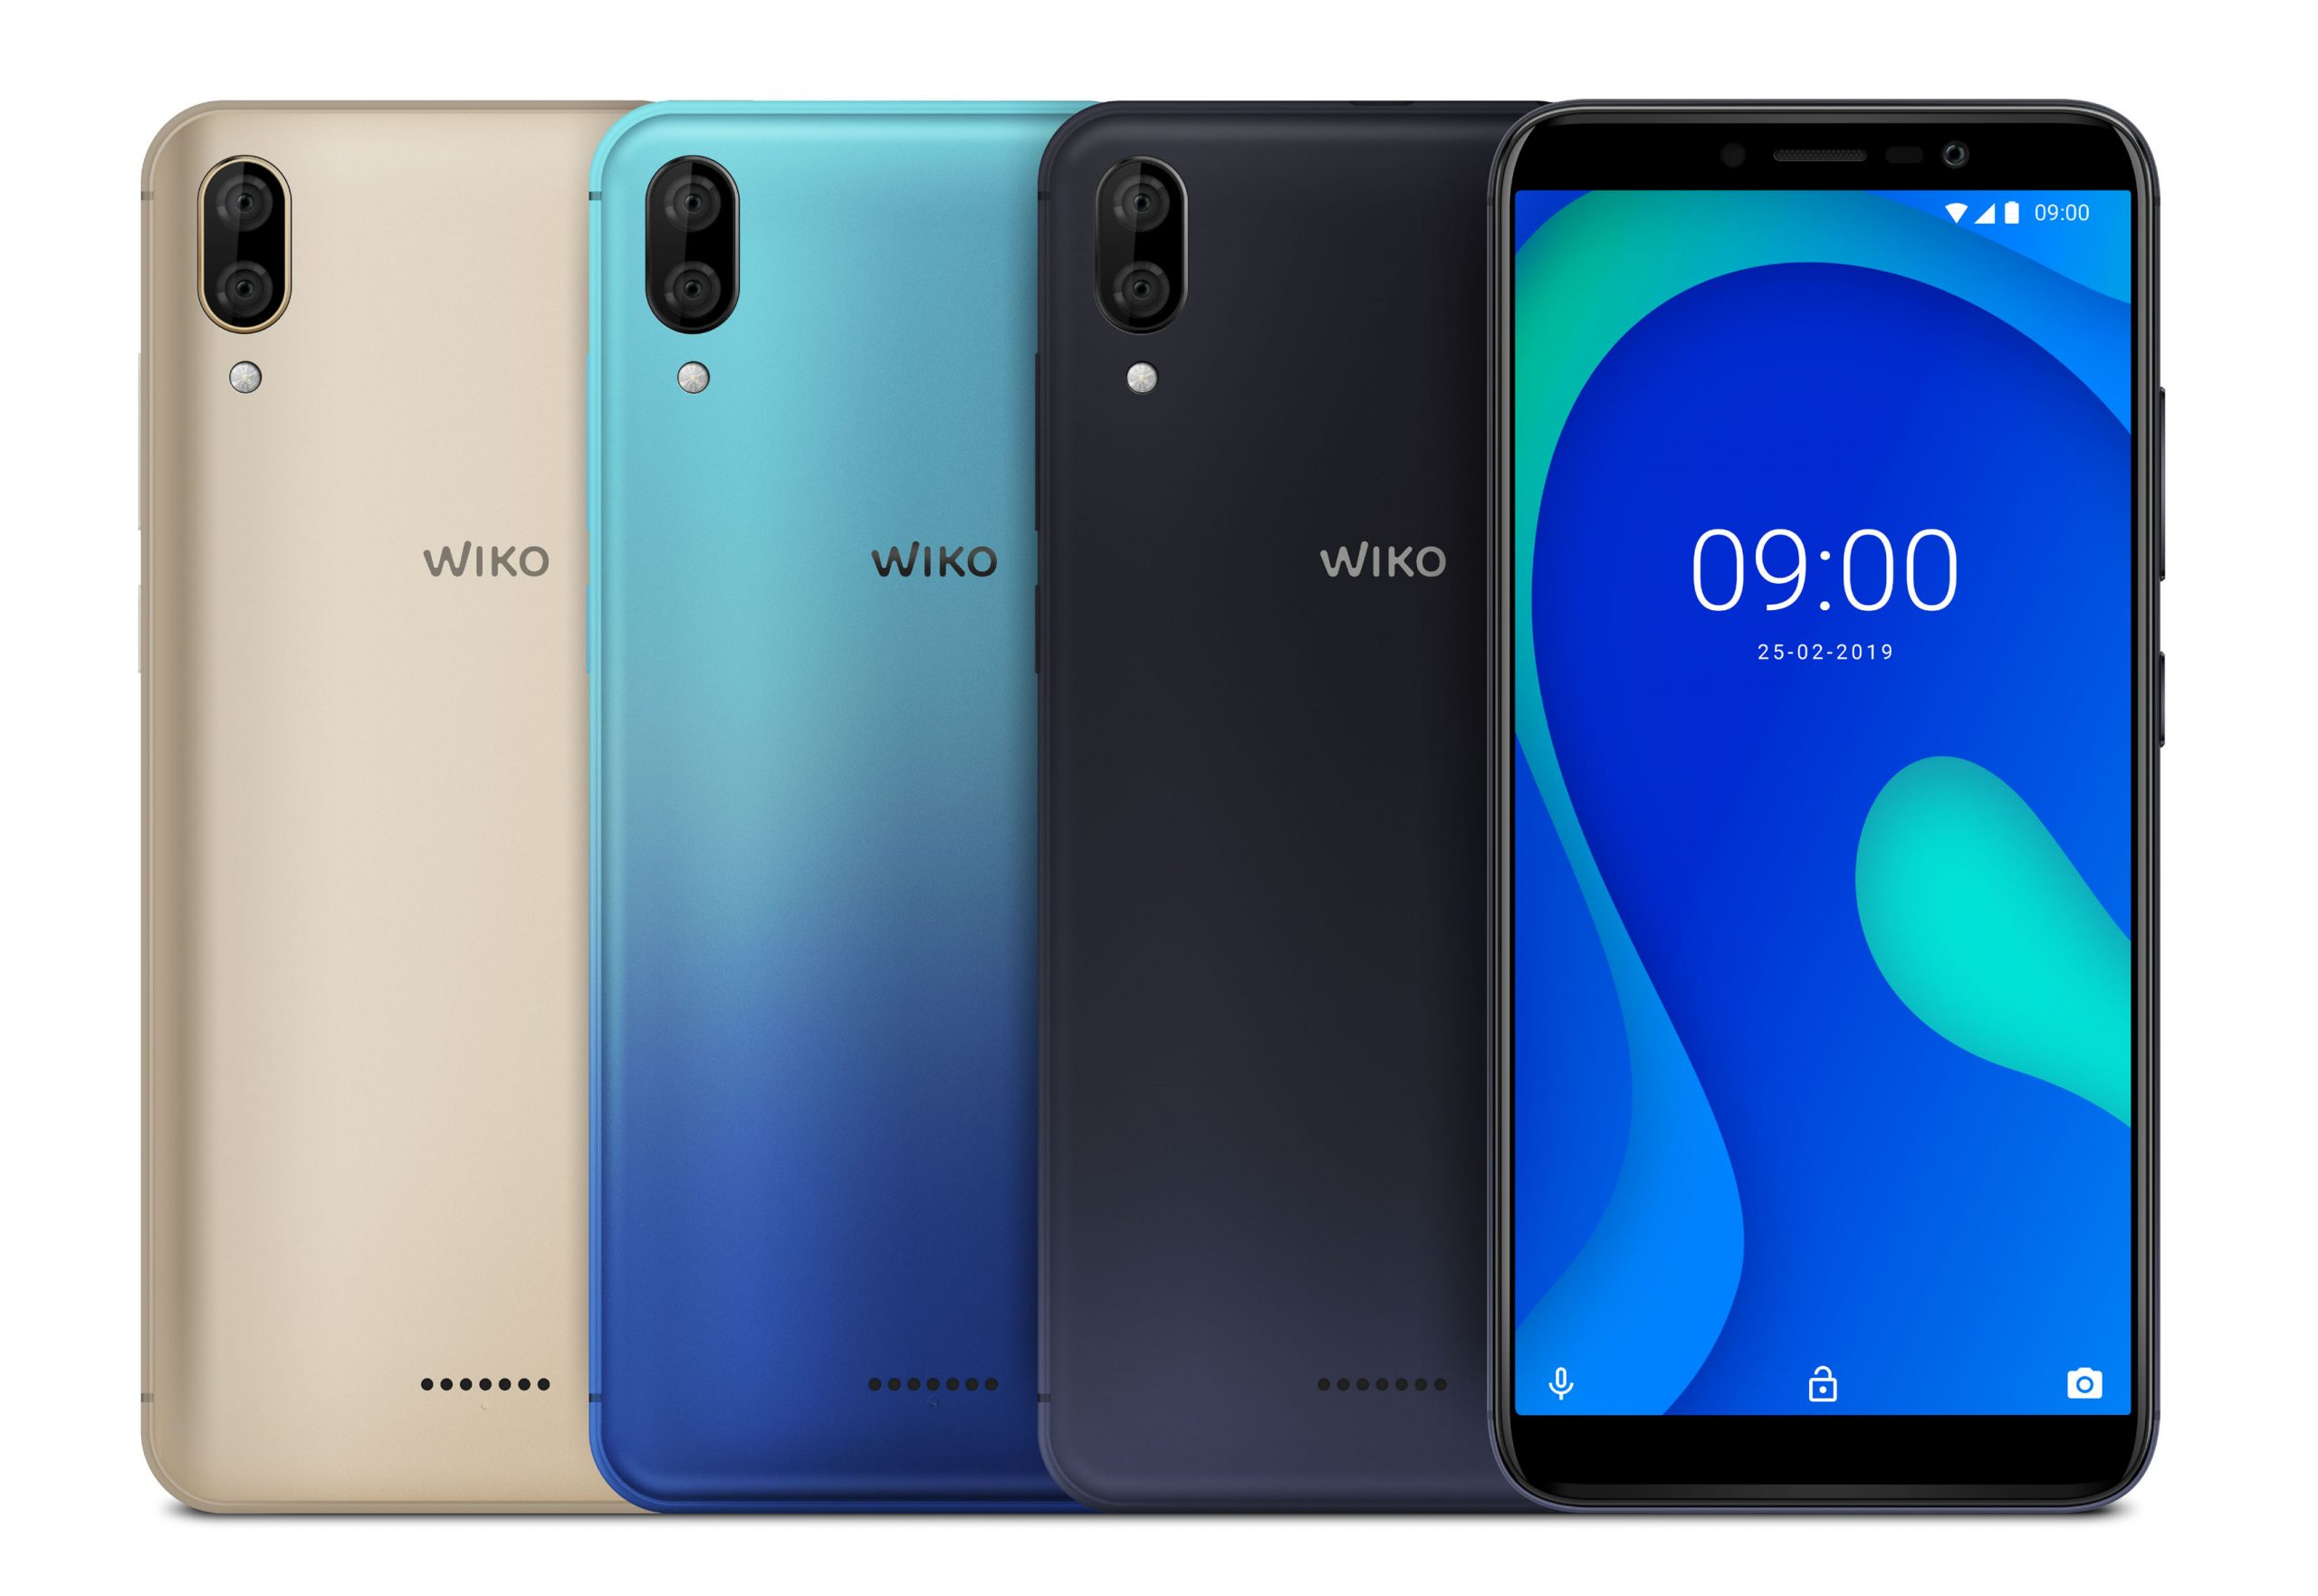 Wiko Y80 nuovo smartphone: ampio display e batteria a lunga durata thumbnail